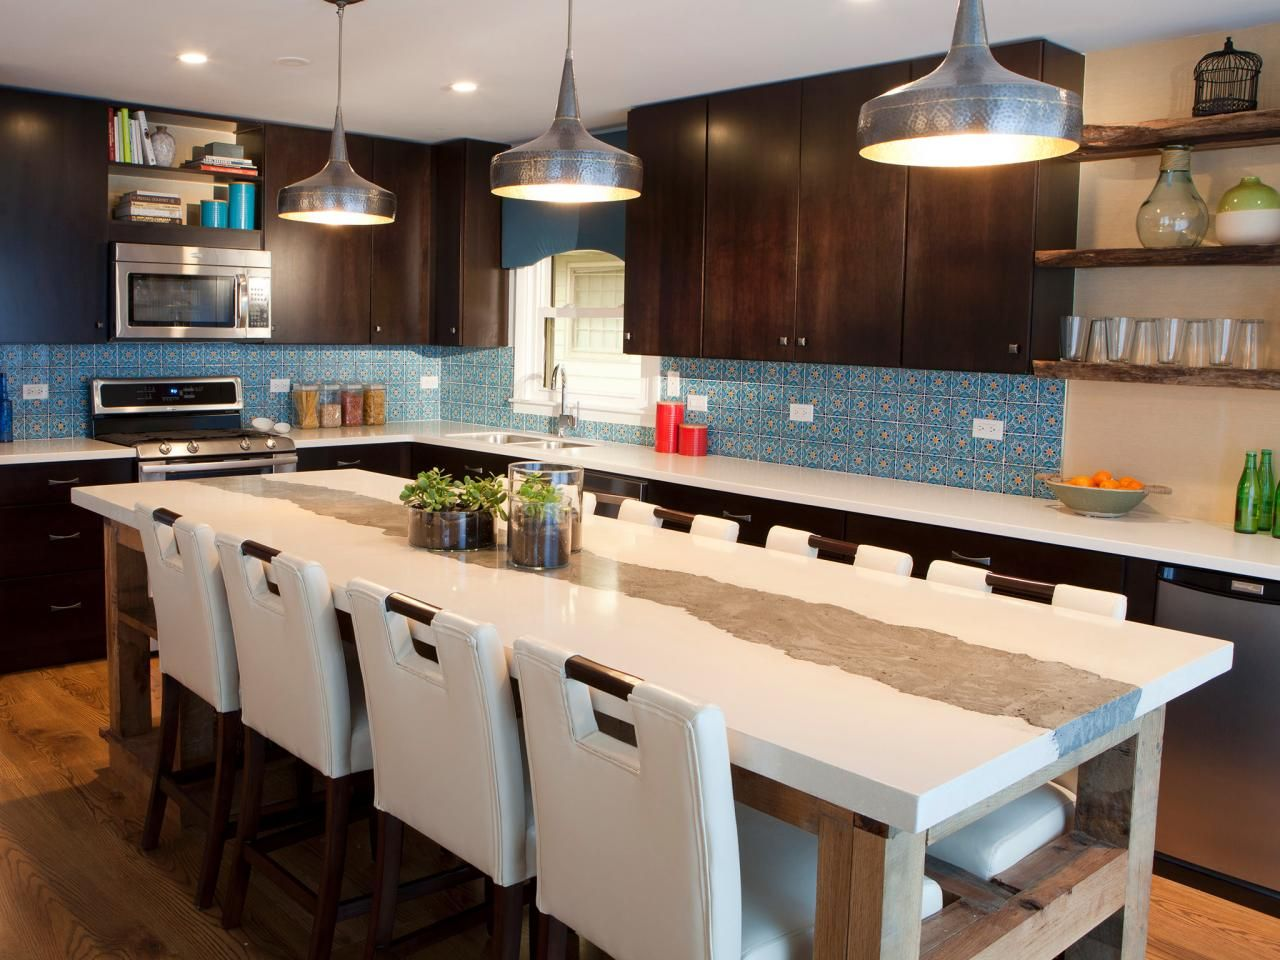 Kitchen Islands Beautiful, Functional Design Options